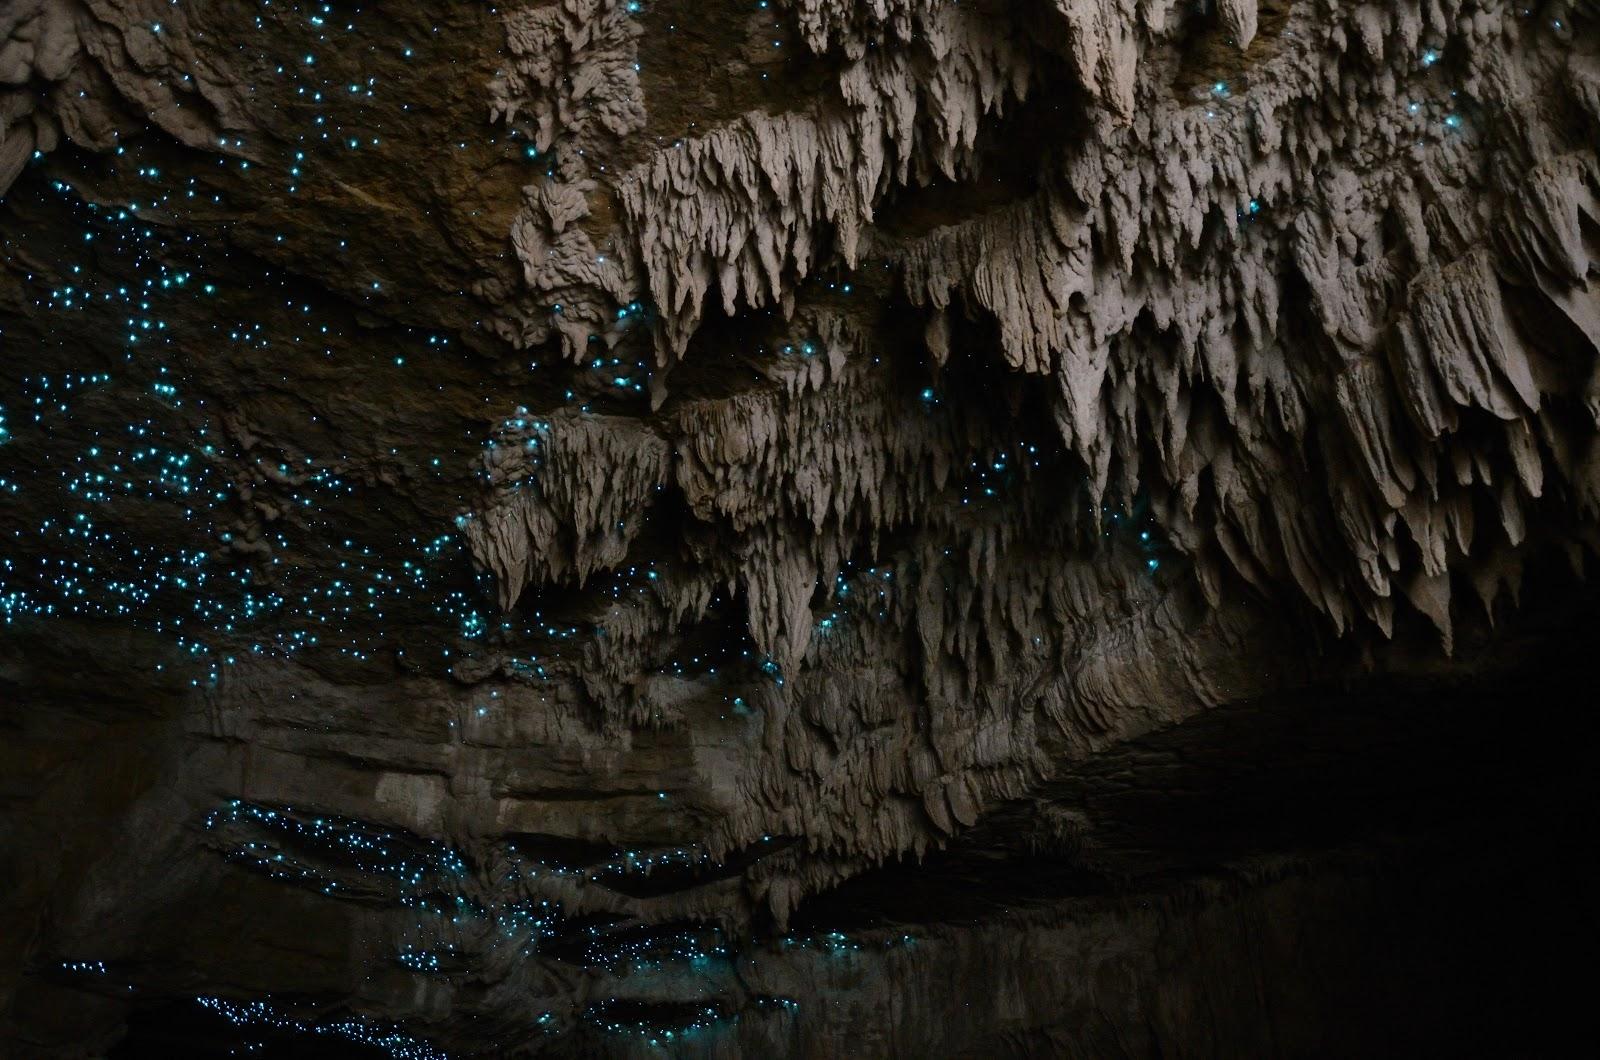 glow worm cave 8759